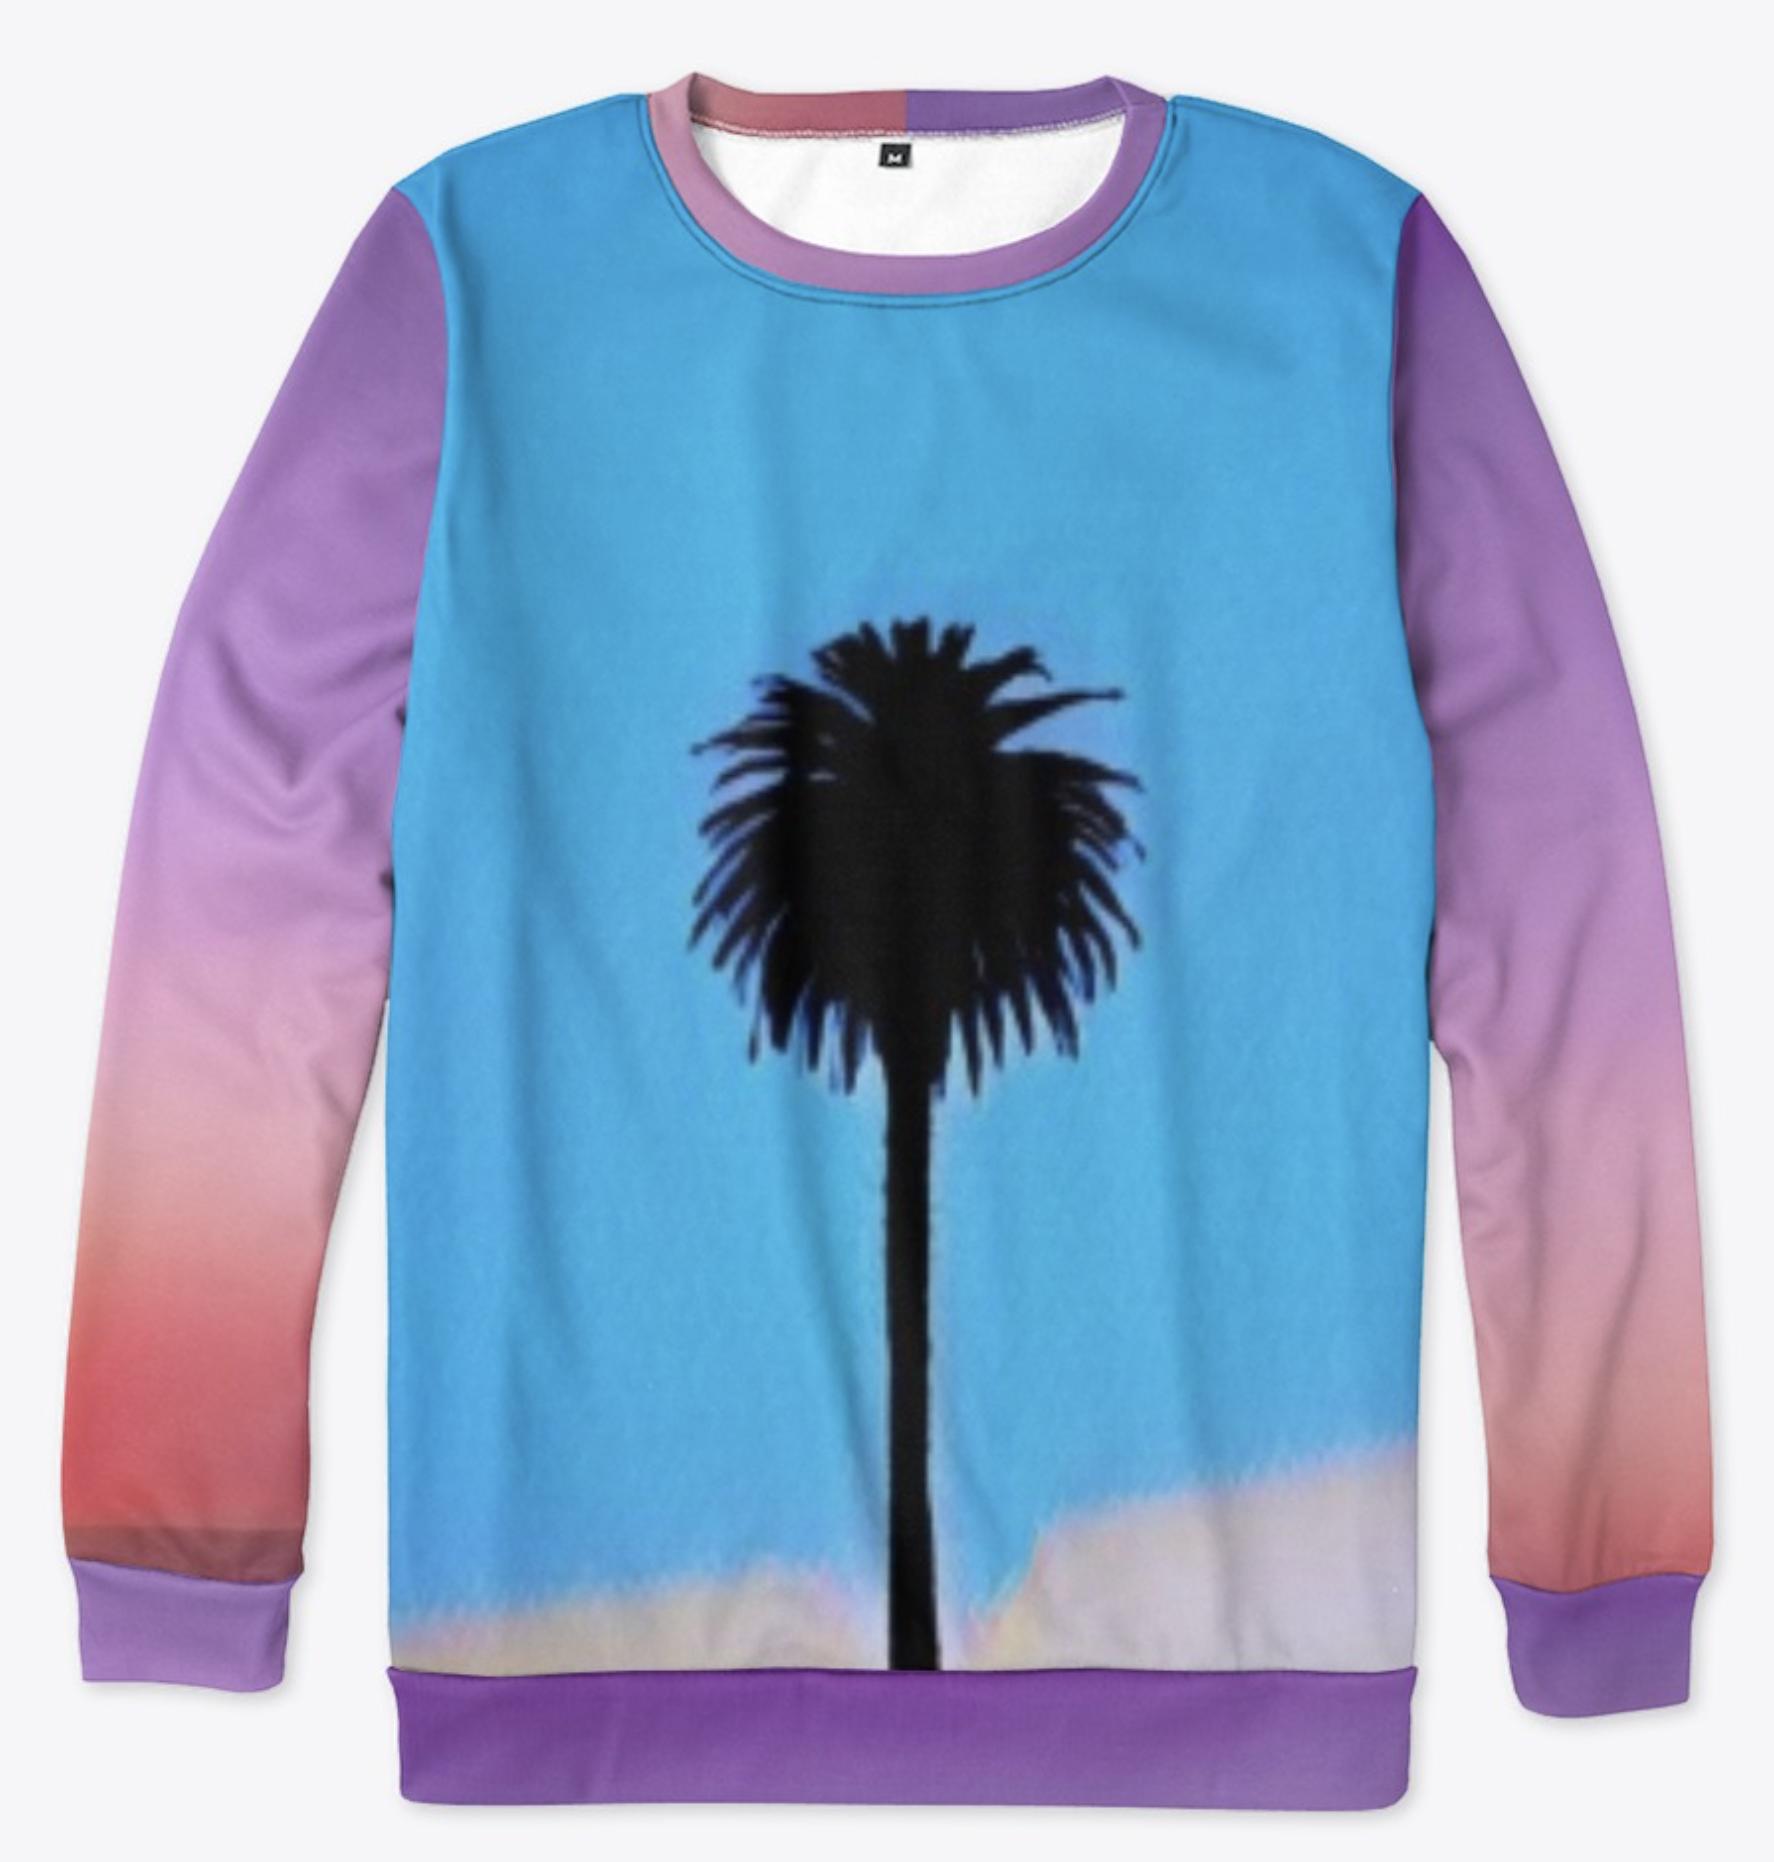 Dance Till We Die - Sweater